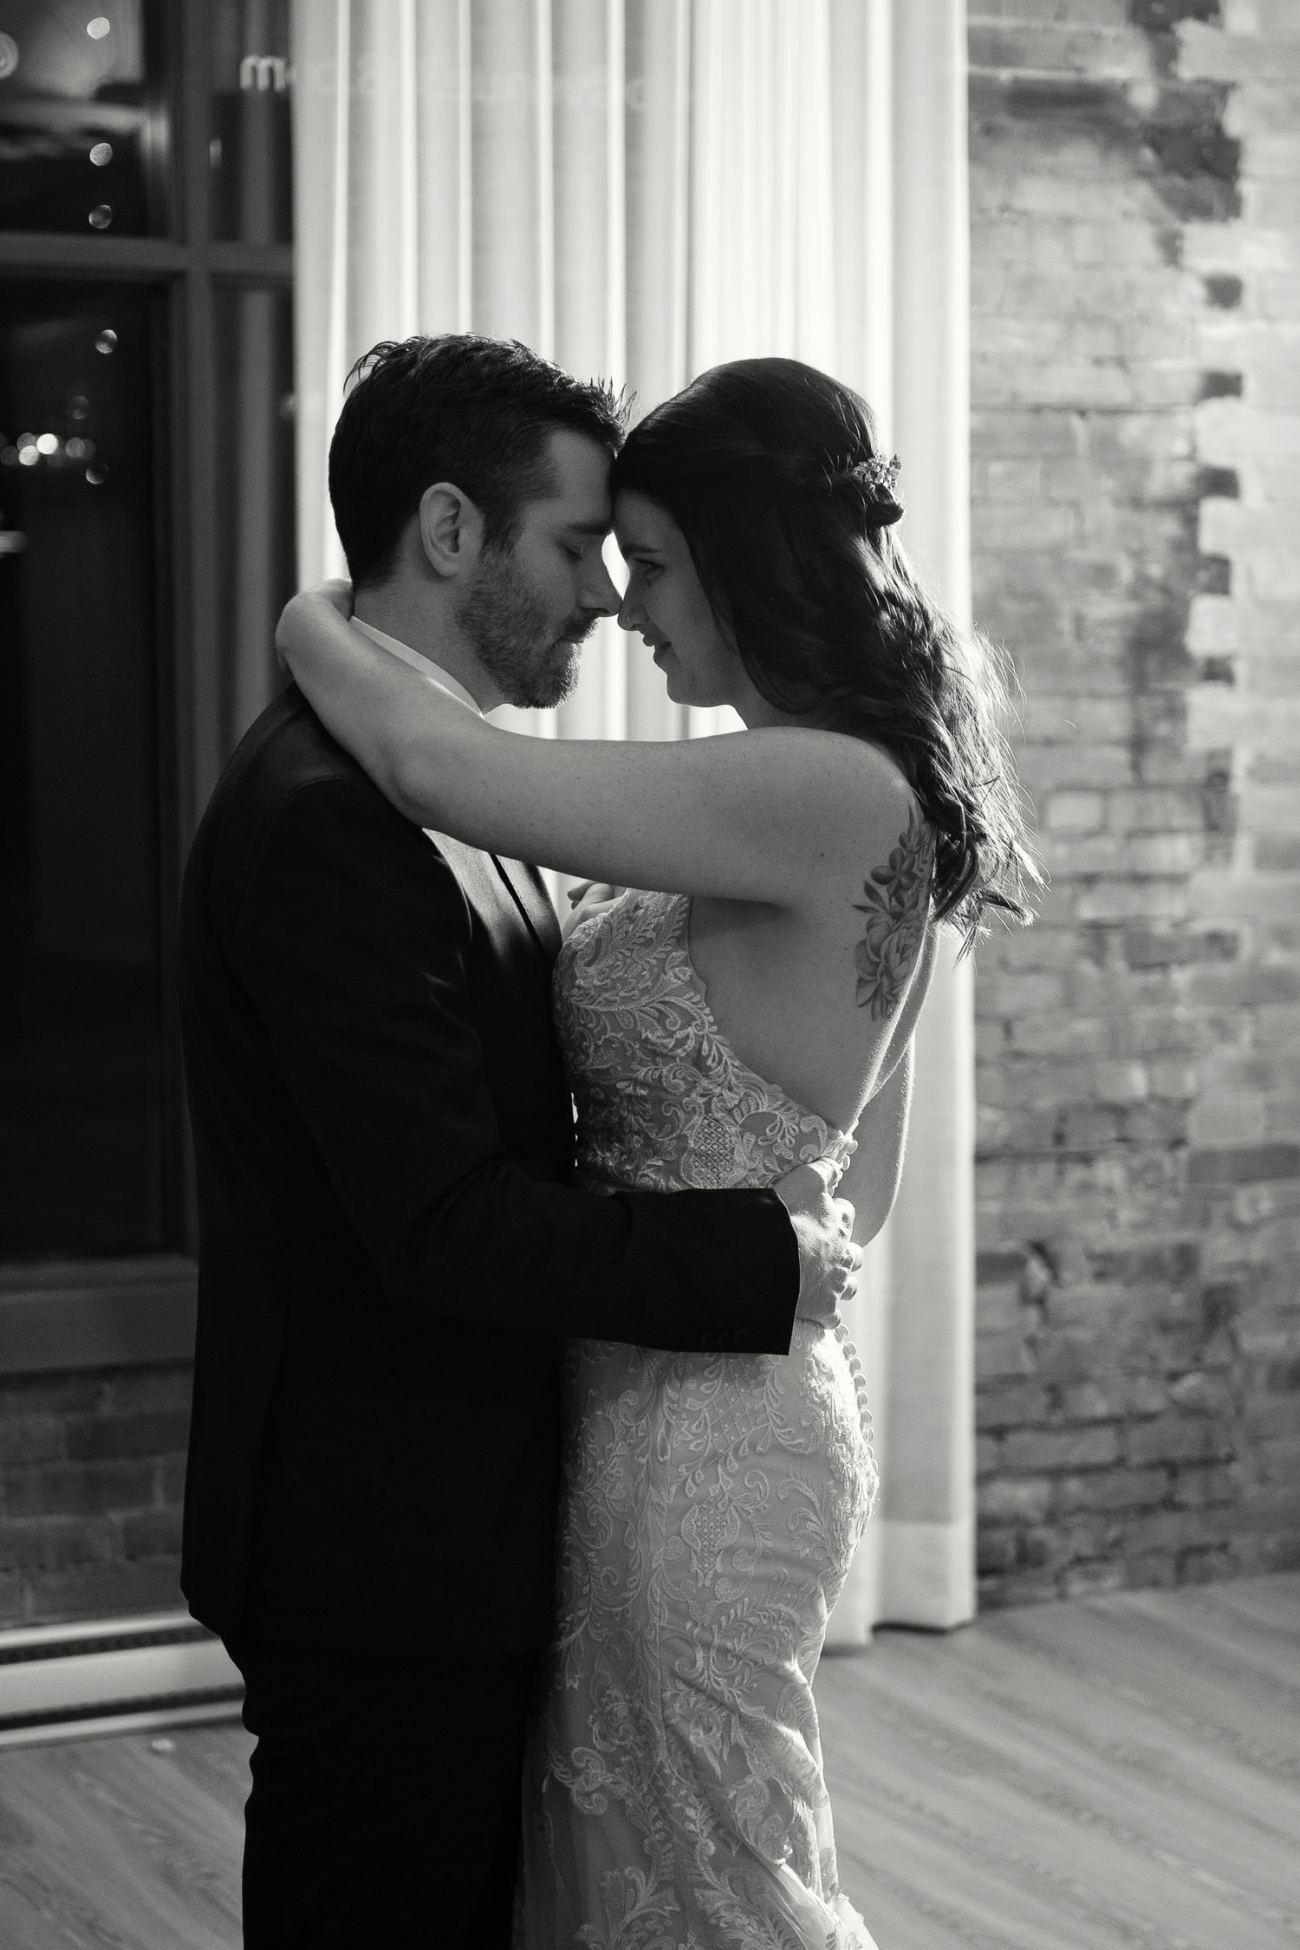 First dance at Venue 308 captured by Calgary wedding photographer Tara Whittaker